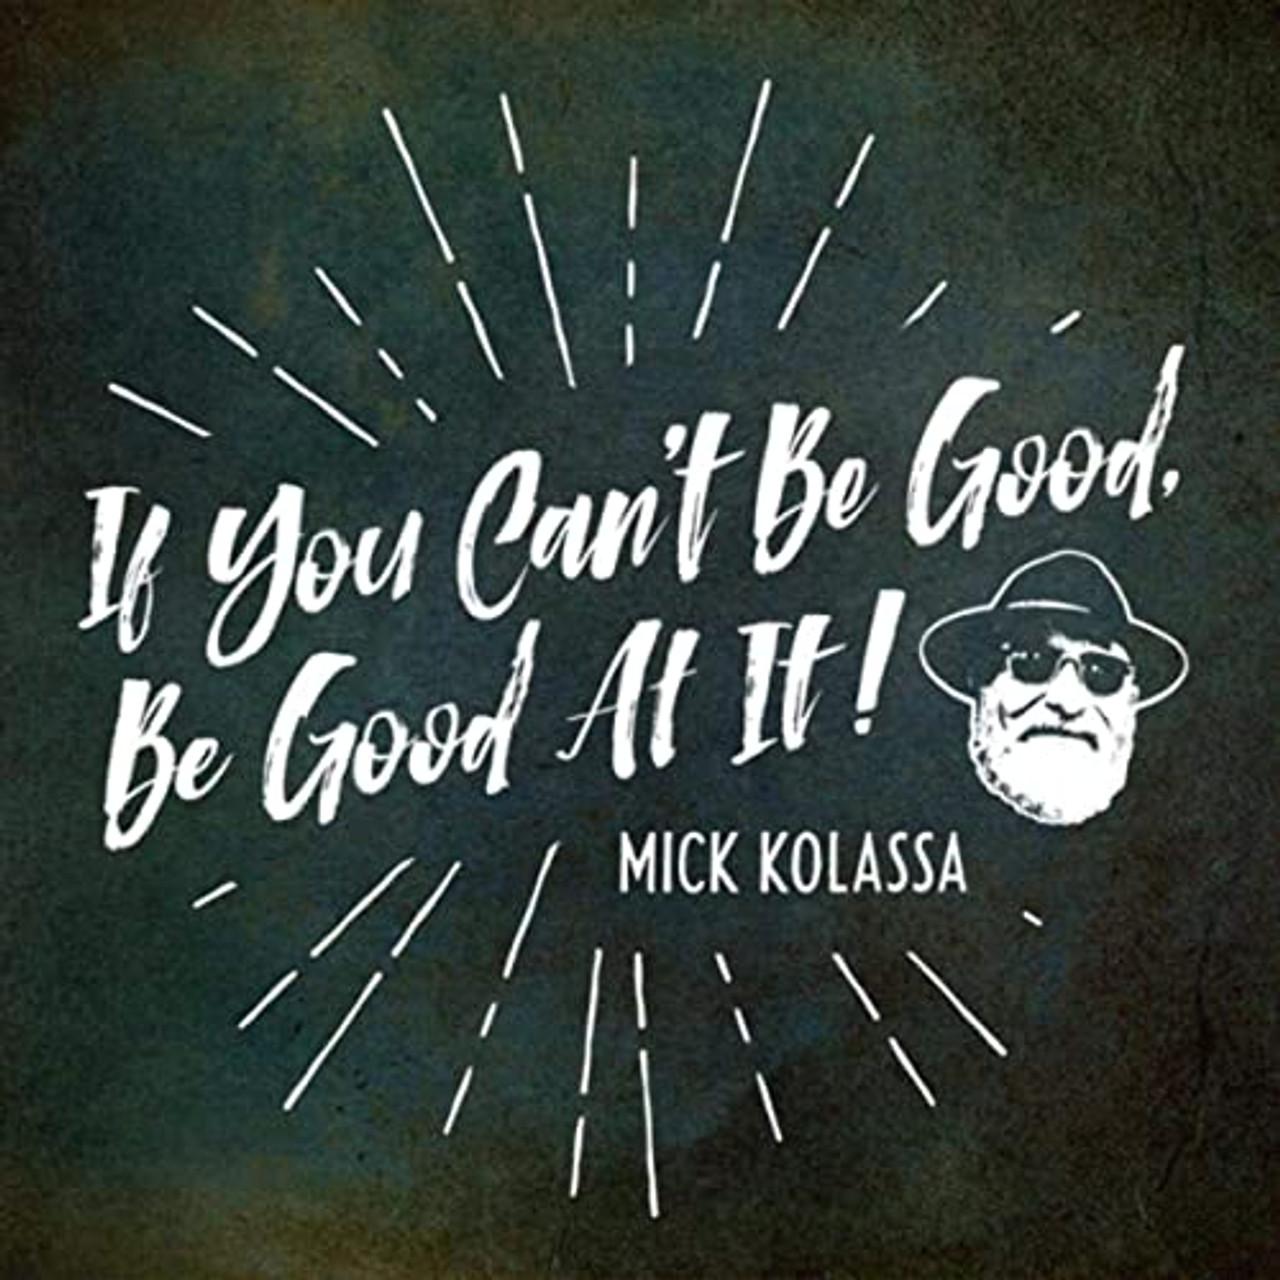 MICK KOLASSA - IF YOU CAN'T BE GOOD, BE GOOD AT IT